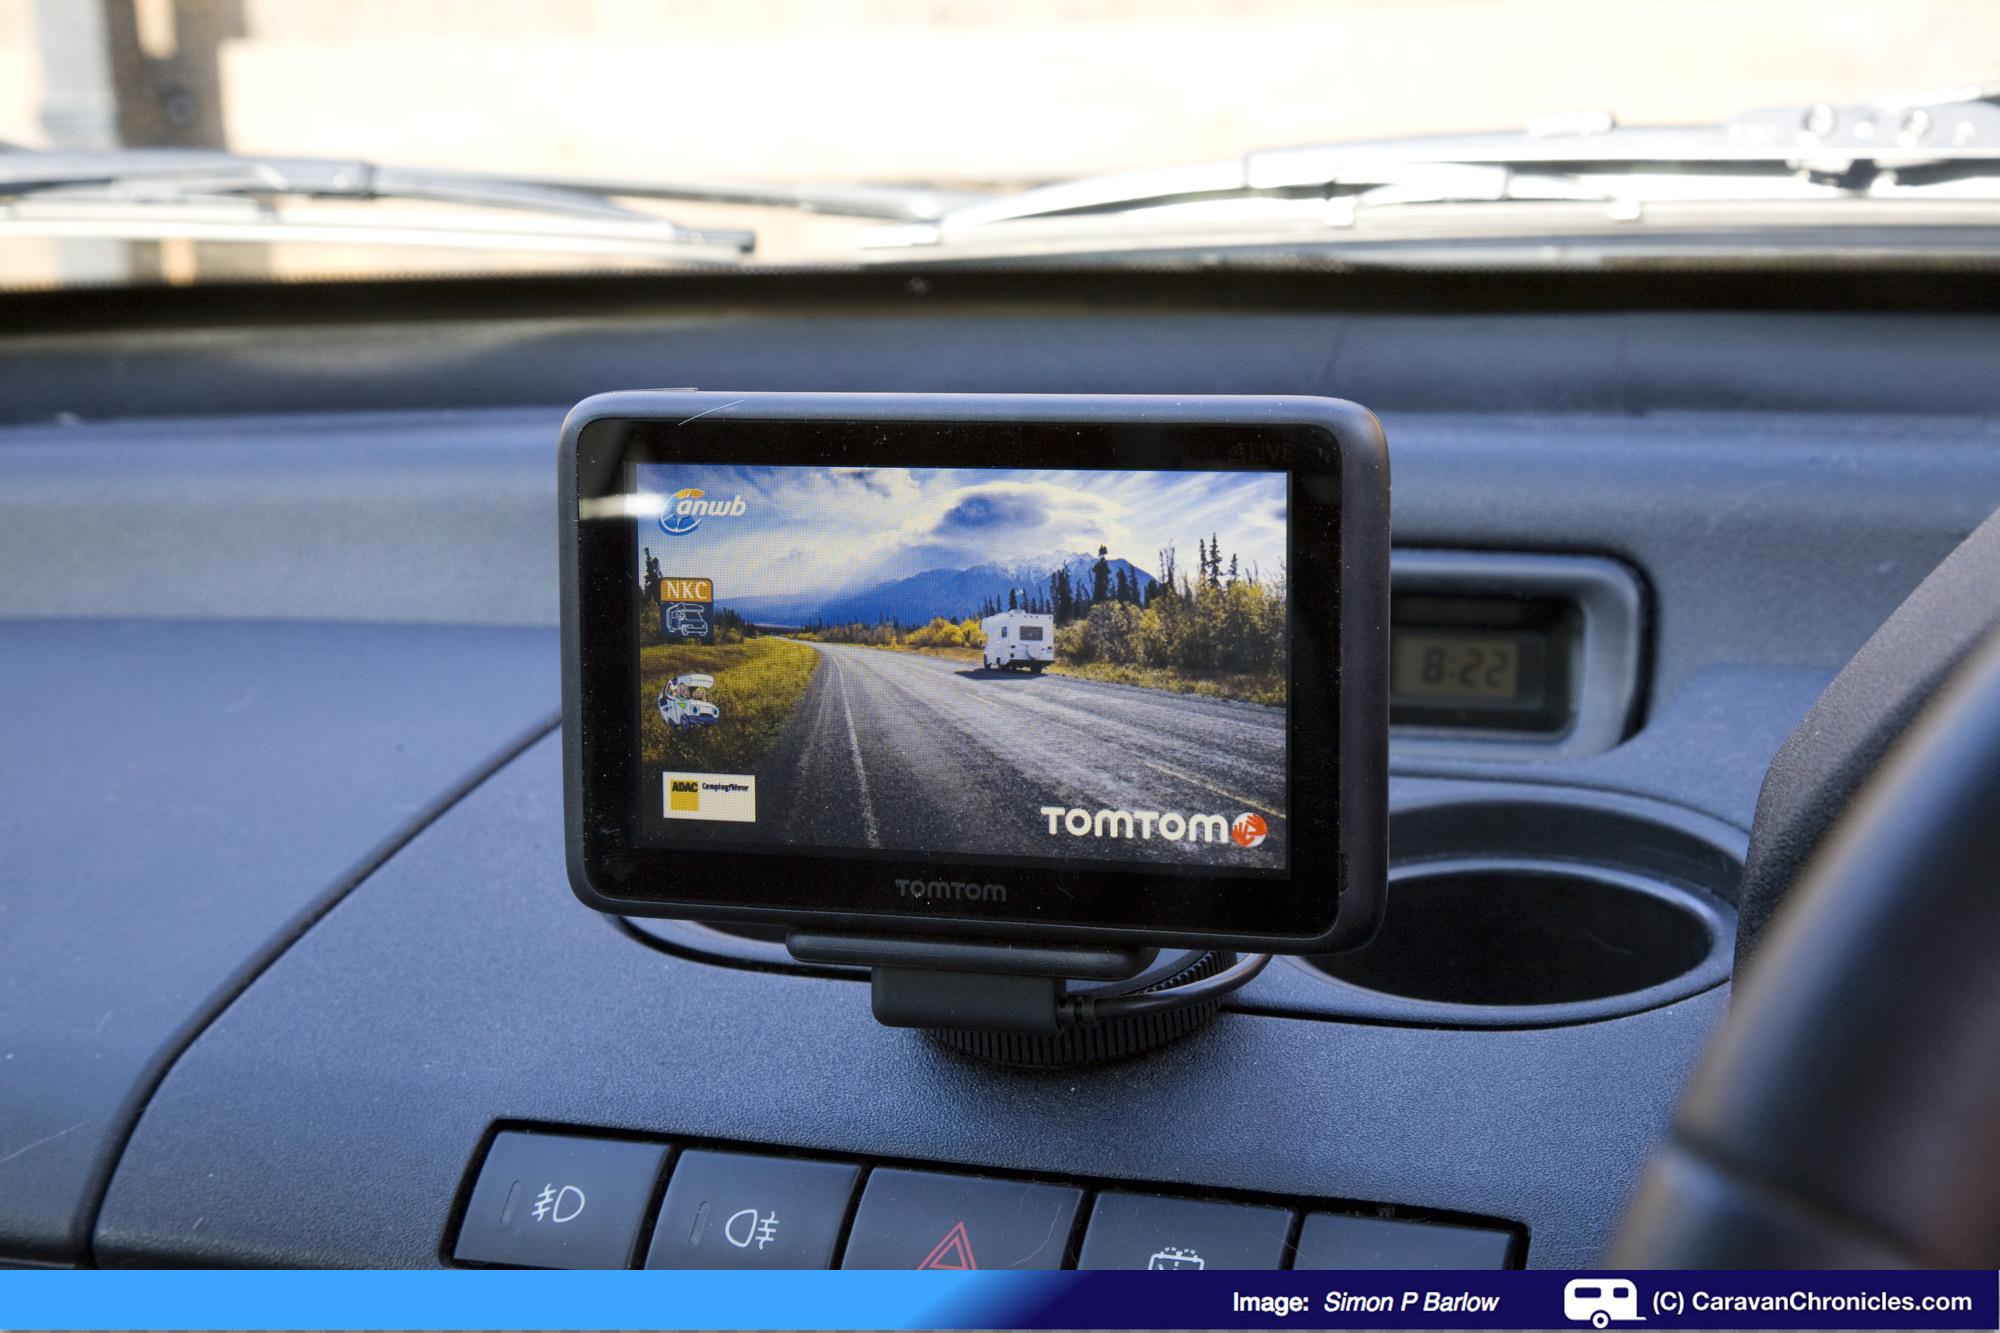 Review of the TomTom GO LIVE Camper and Caravan Sat Nav | Caravan